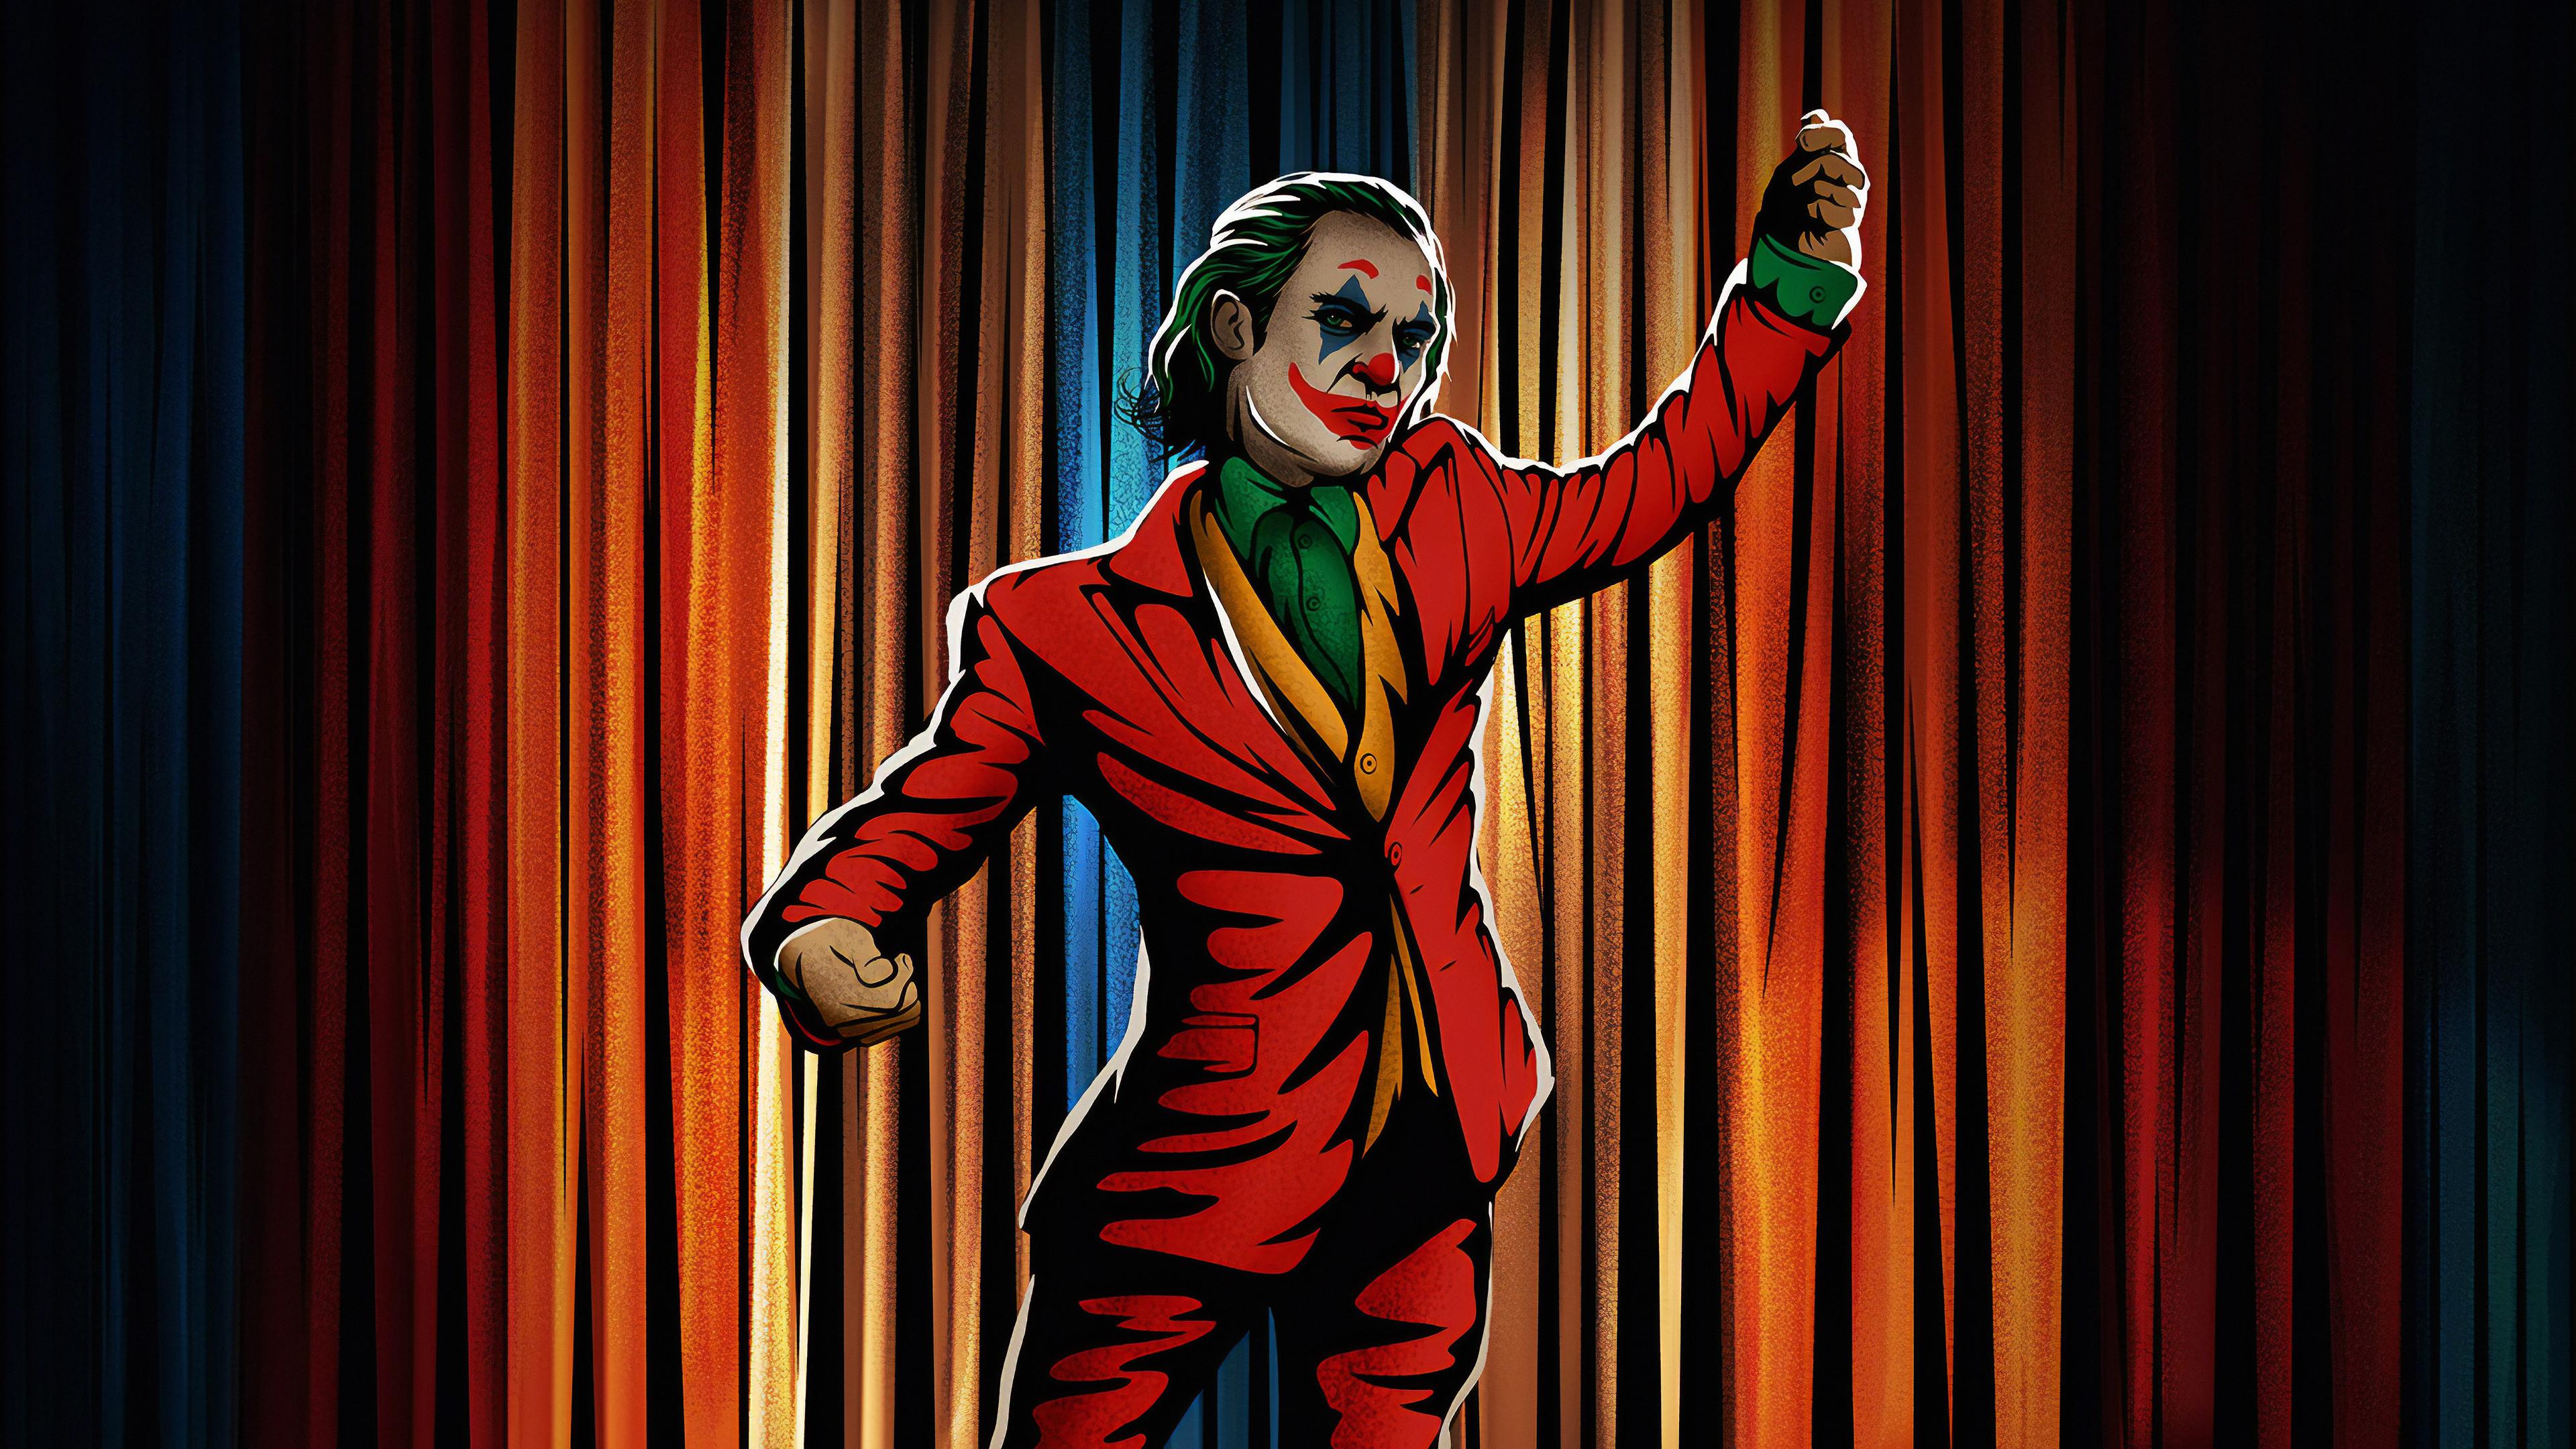 Joker Dancing Hd Superheroes 4k Wallpapers Images